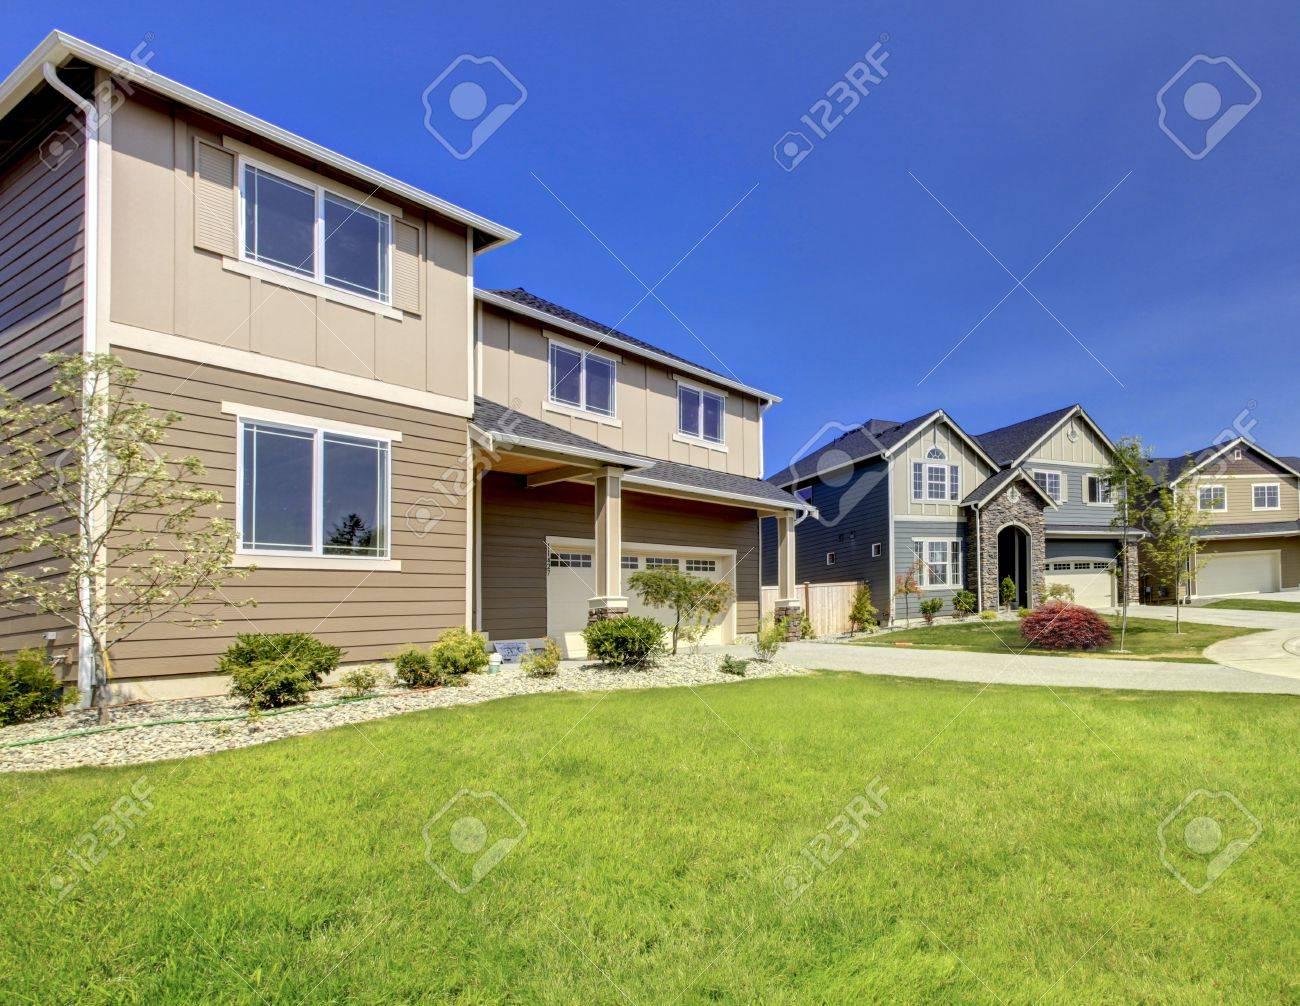 Typical American Midclass Neubau Haus Außen Lizenzfreie Fotos ...